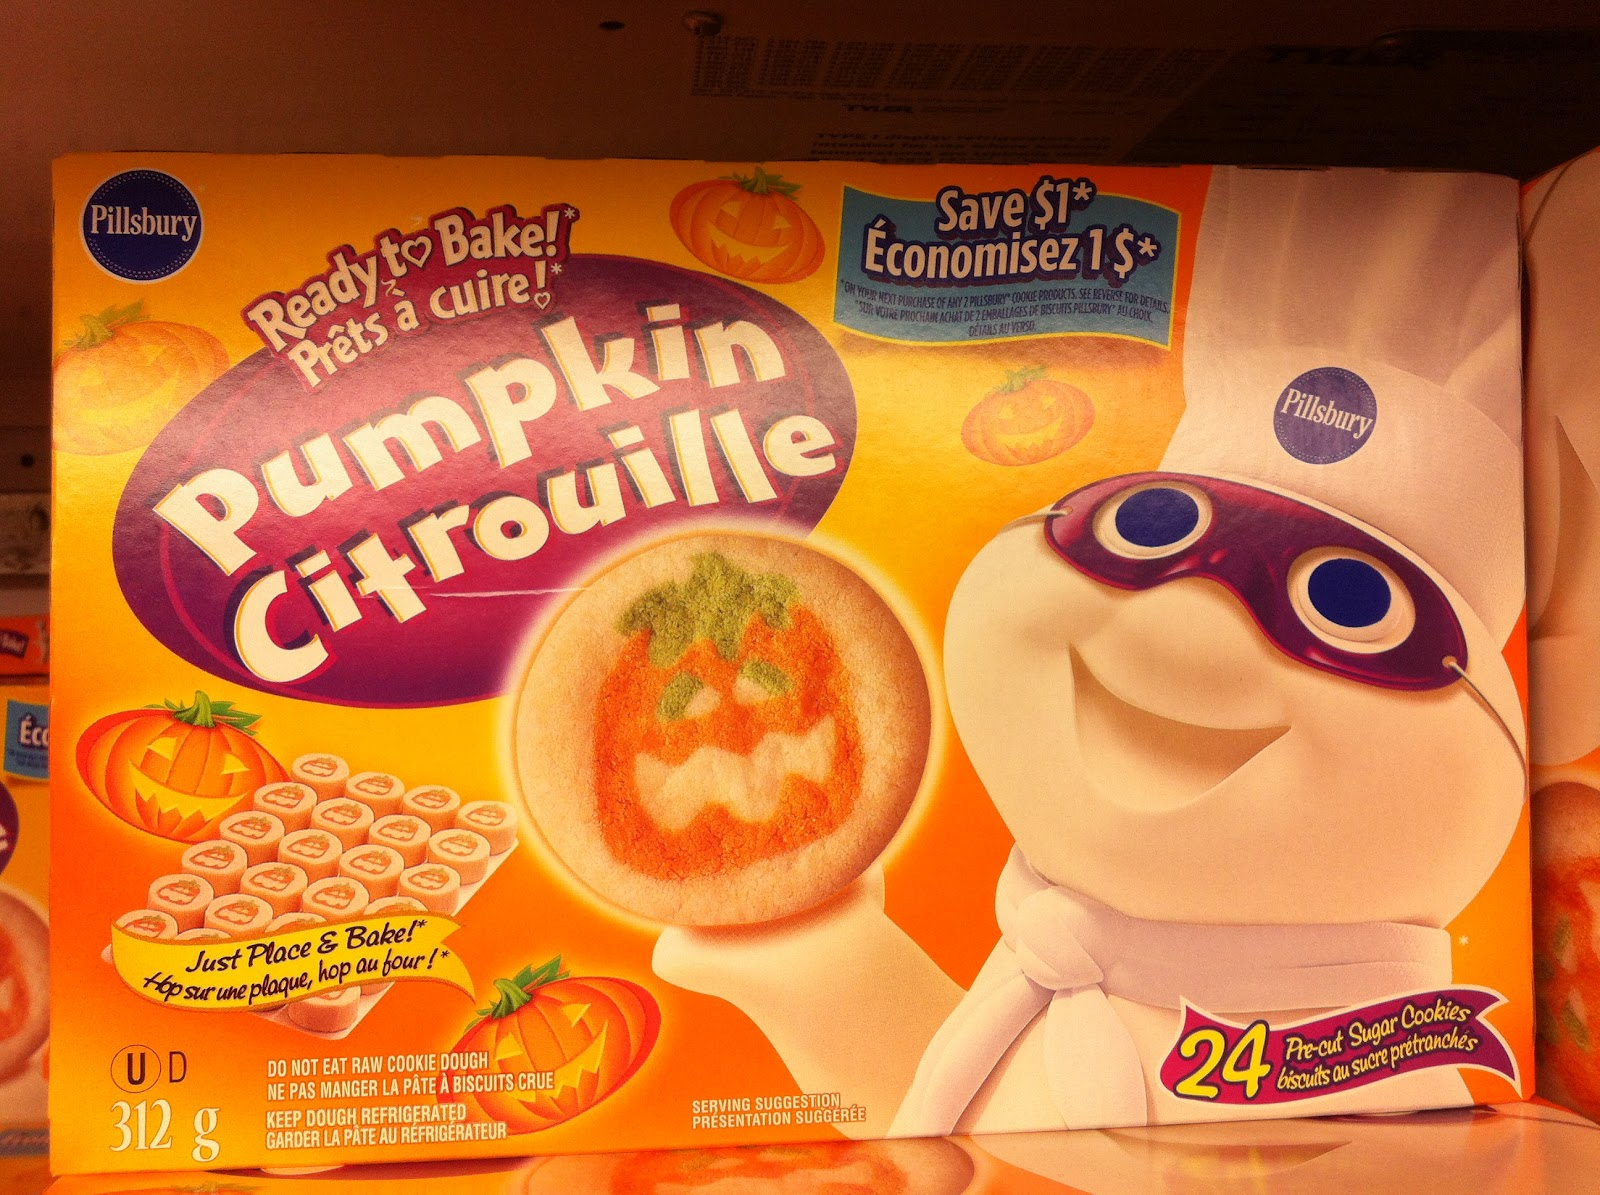 walking the candy aisle - Pillsbury Dough Boy Halloween Cookies